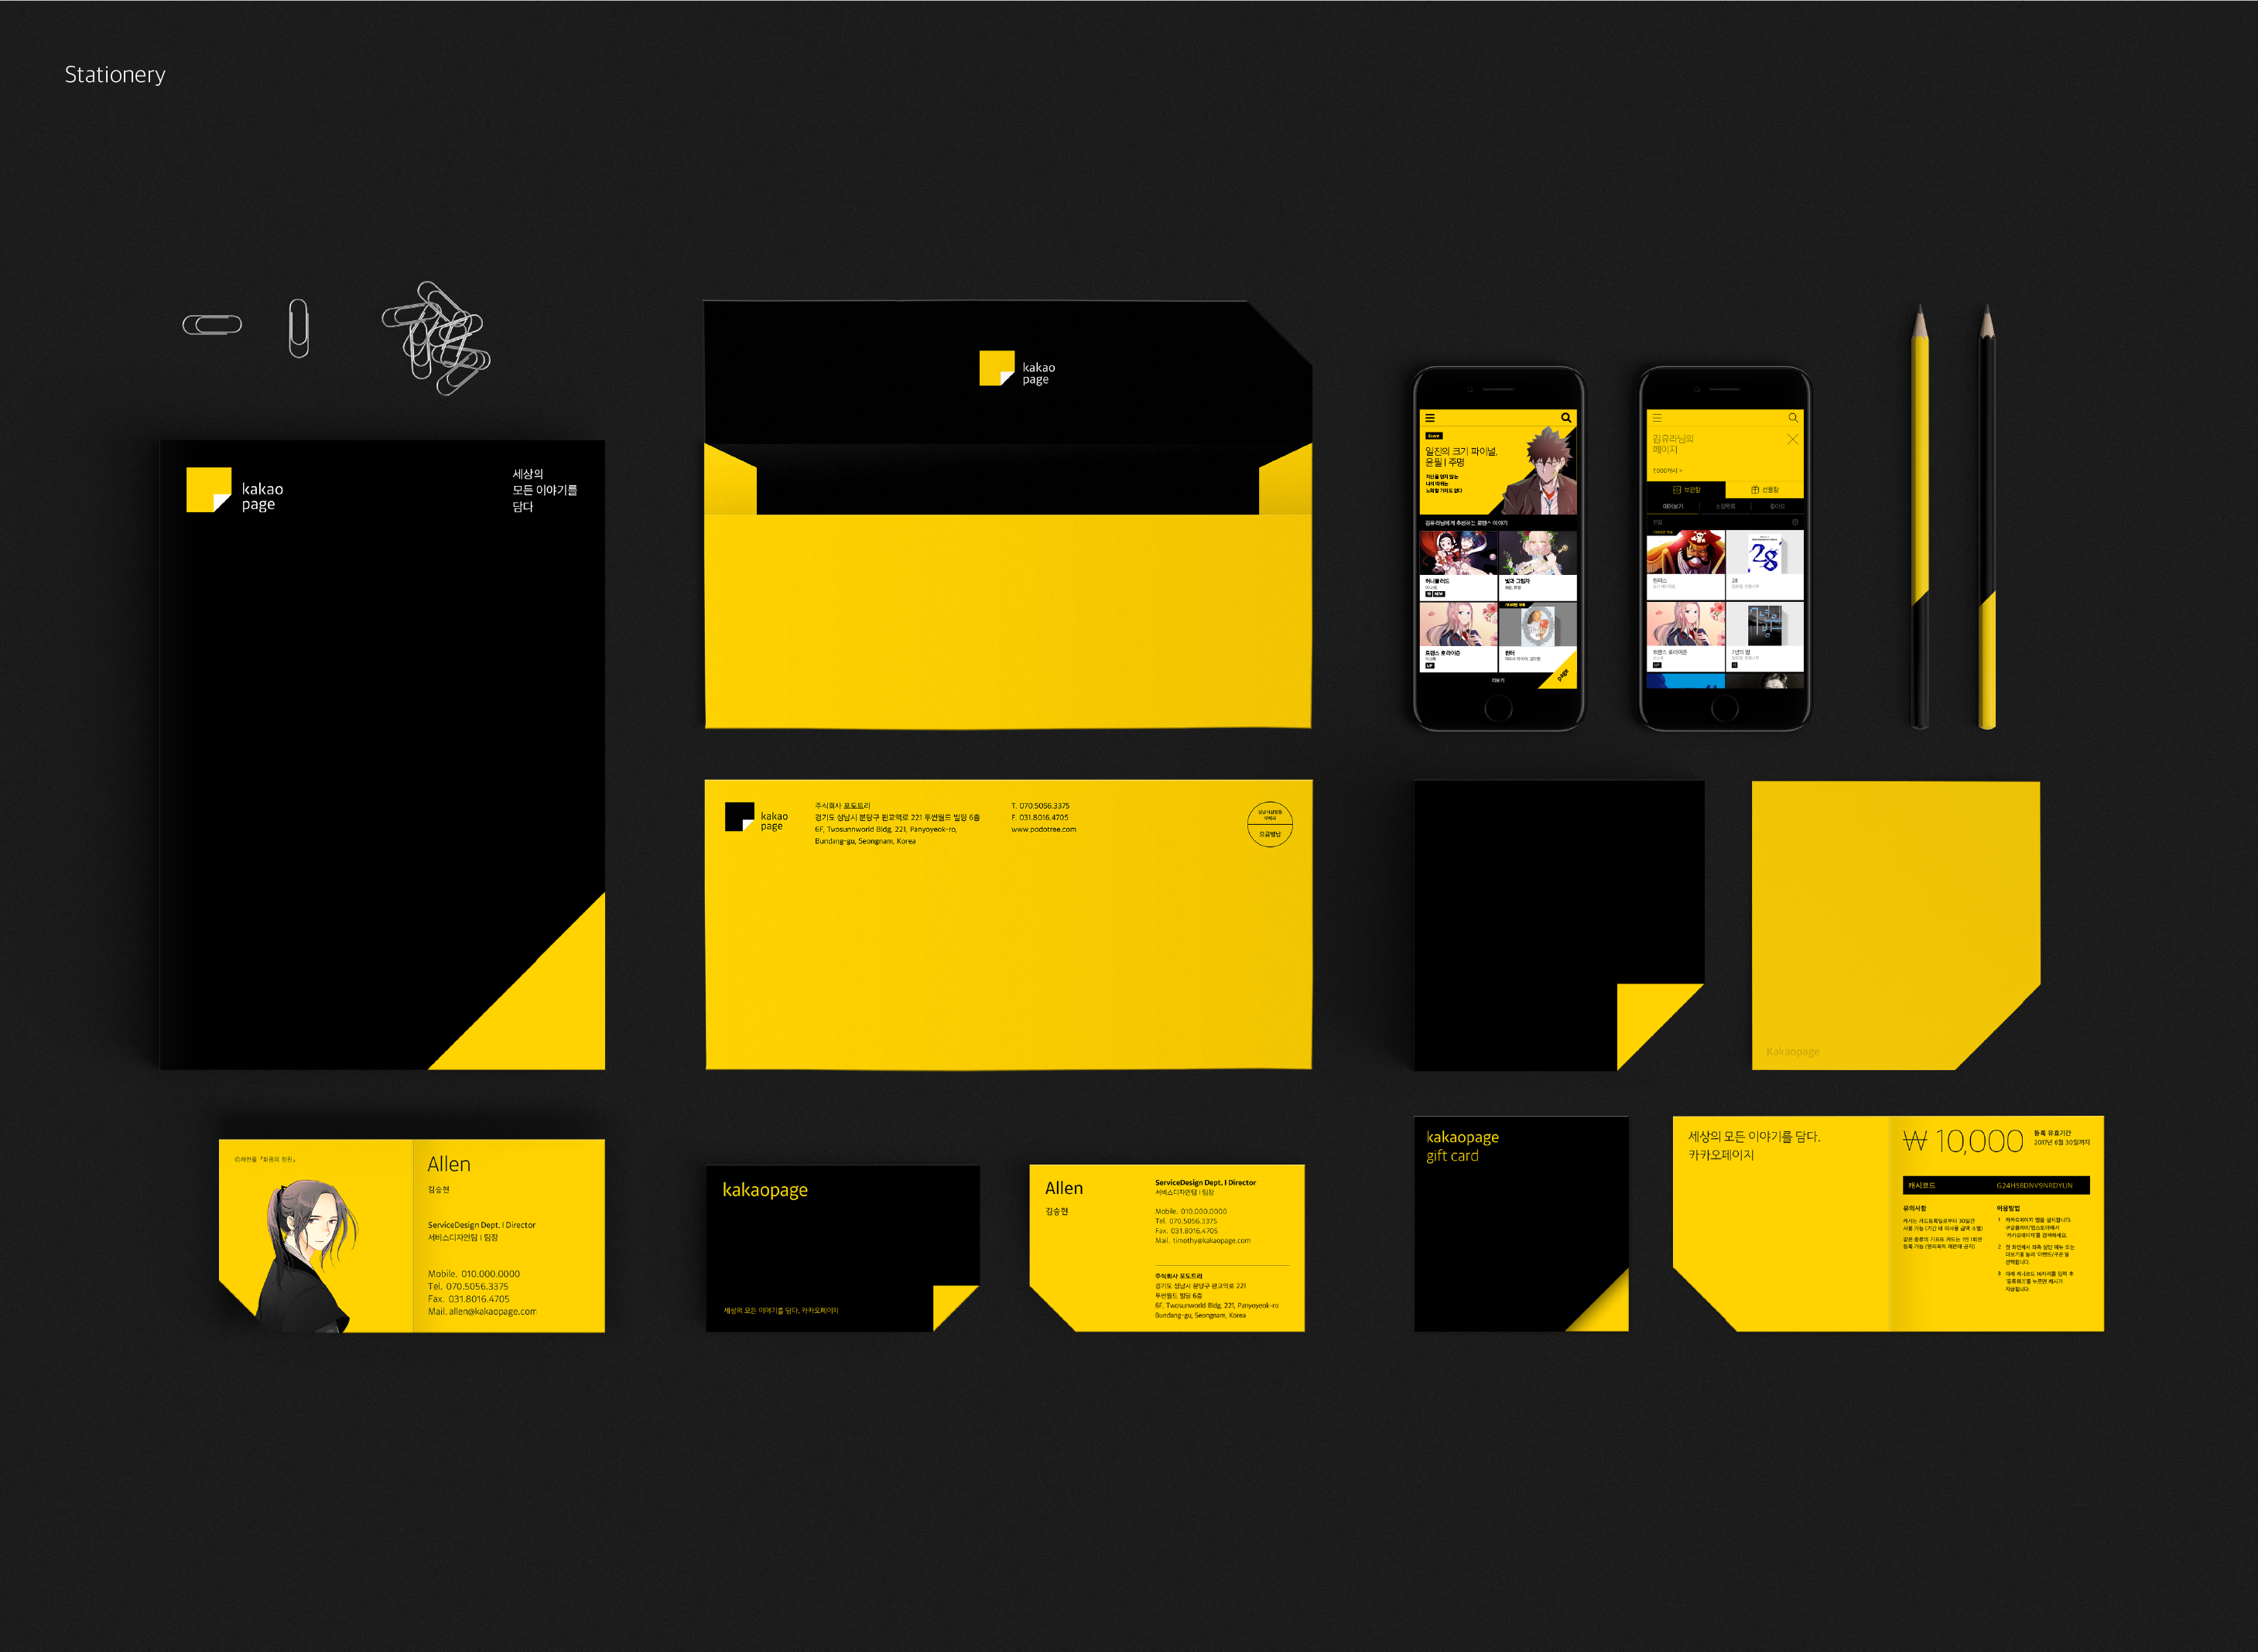 kakaopage-Brand-eXperience-Design-Renewal-39